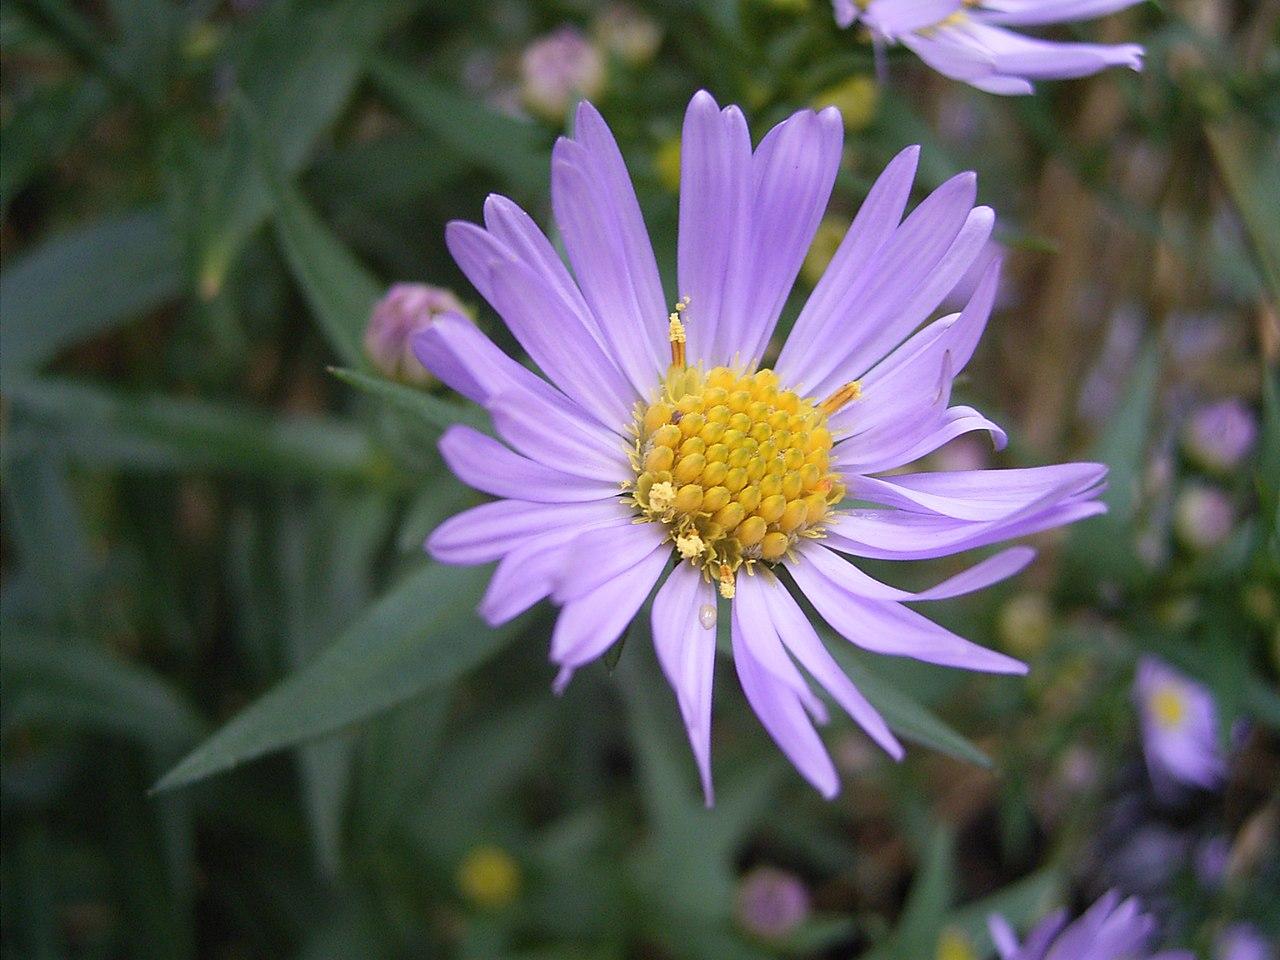 https://upload.wikimedia.org/wikipedia/commons/thumb/1/16/AsterNovi-belgii-flower-1mb.jpg/1280px-AsterNovi-belgii-flower-1mb.jpg